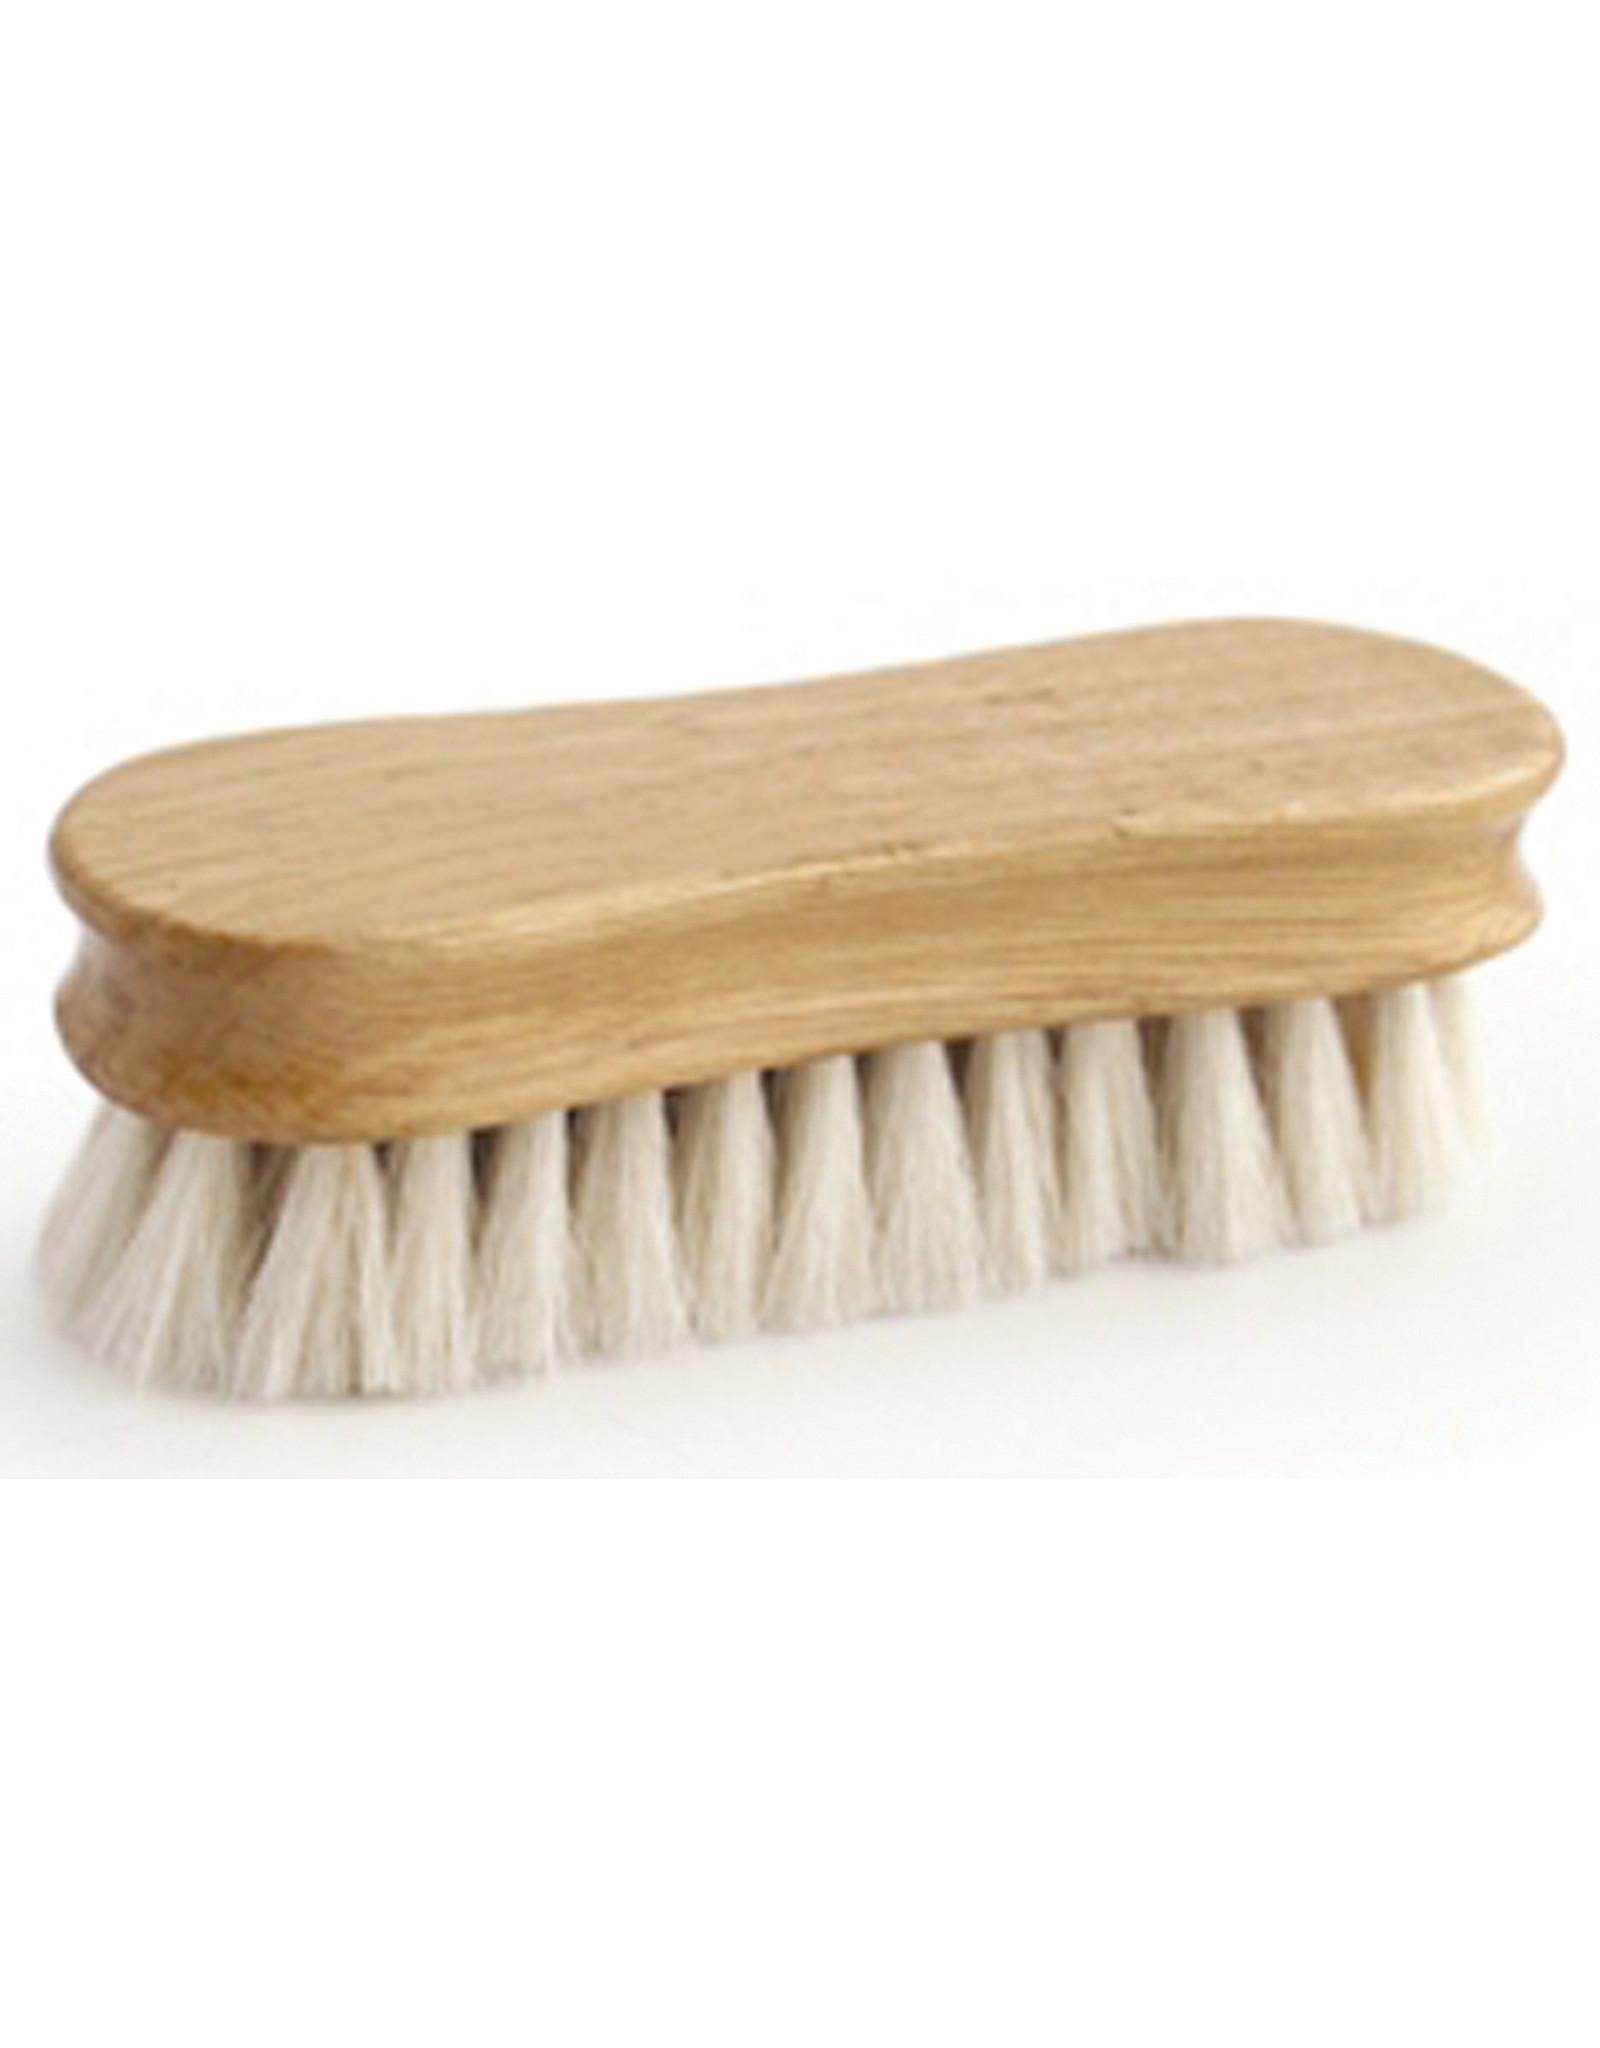 Legends™ #2287 Soft White Goat Hair Peanut-Shaped Face Brush